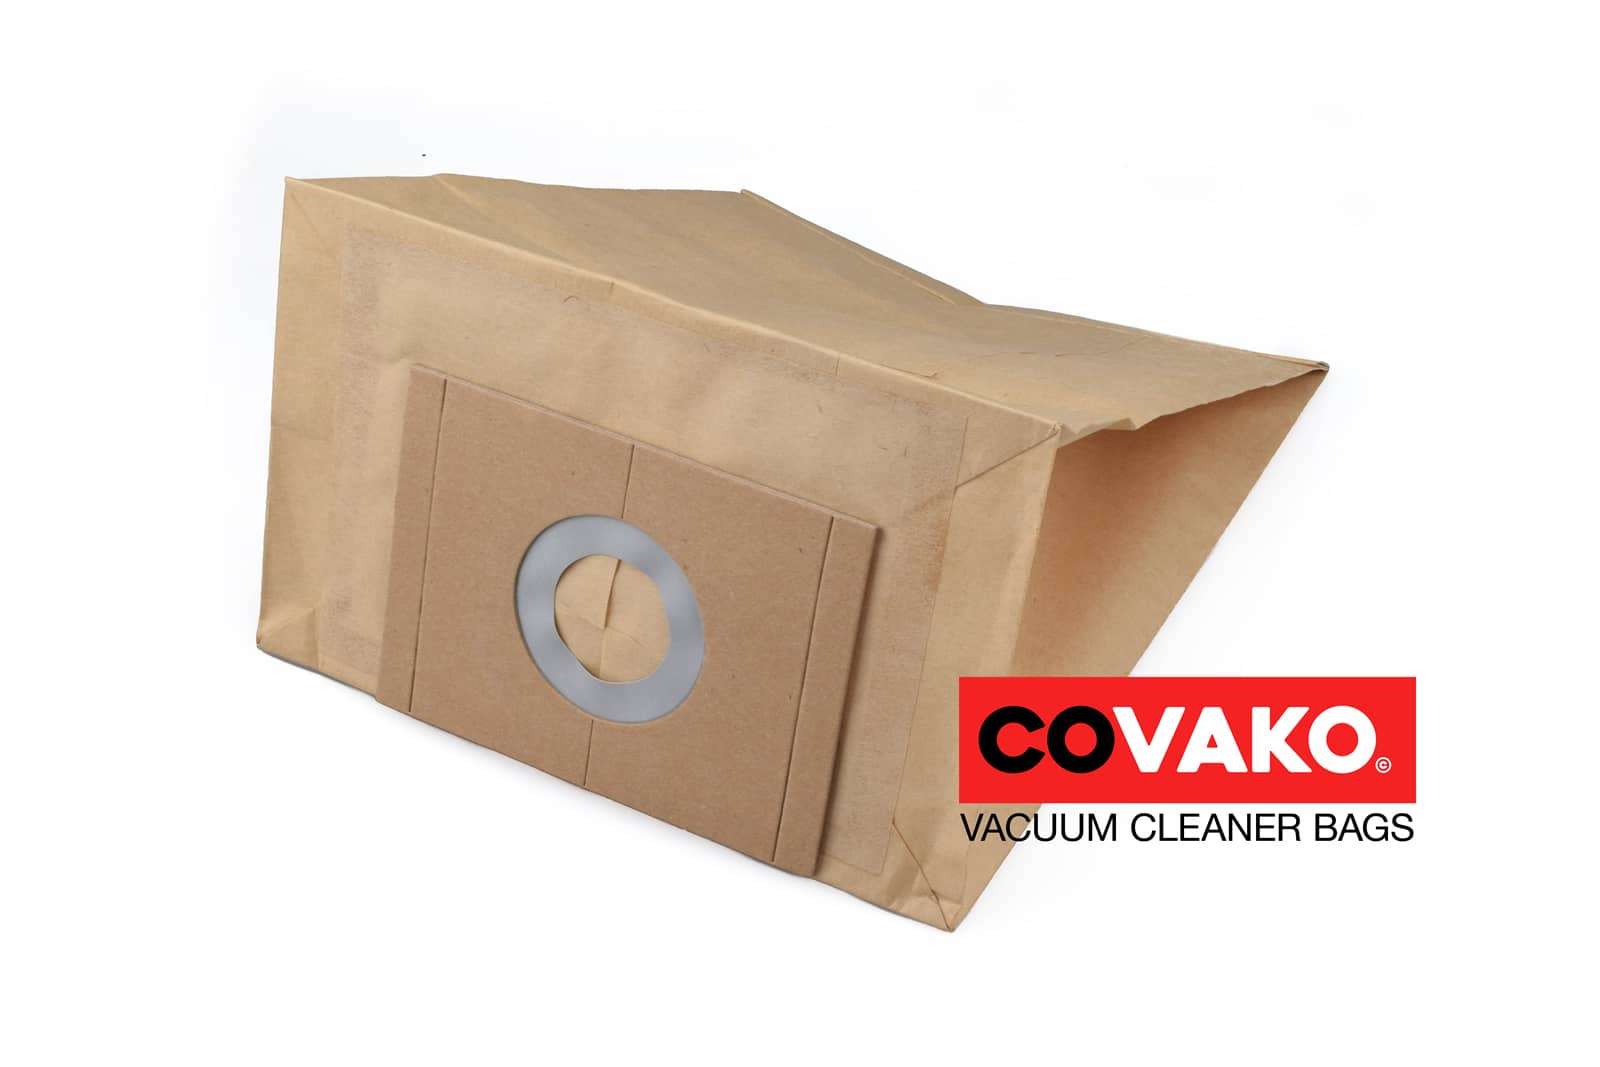 ICA Jet T 117 / Paper - ICA vacuum cleaner bags